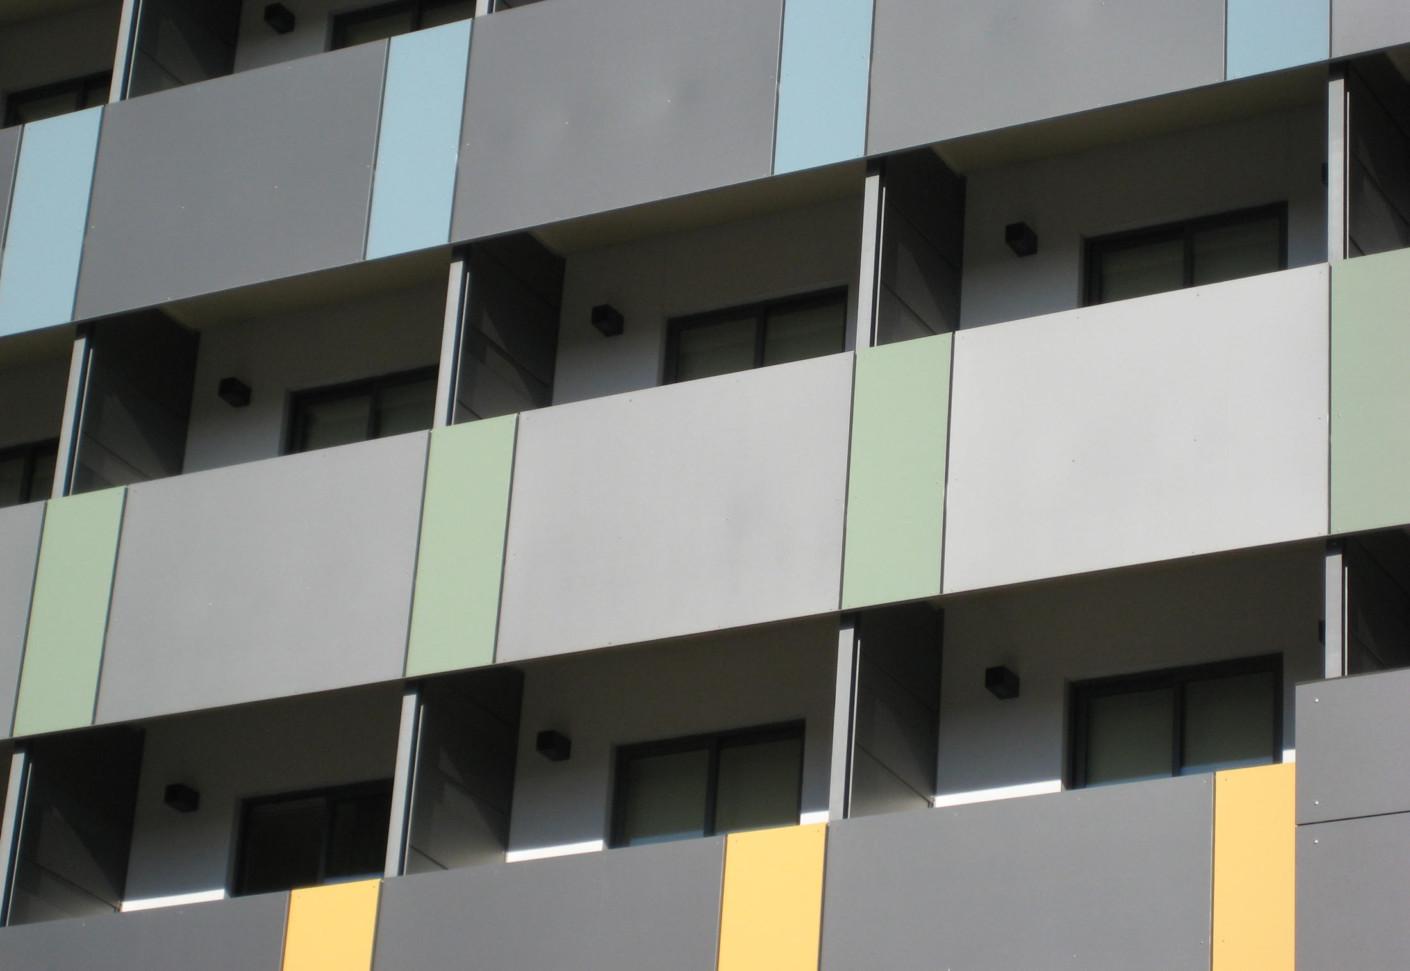 Trespa 174 Meteon 174 Balconies Von Trespa Stylepark